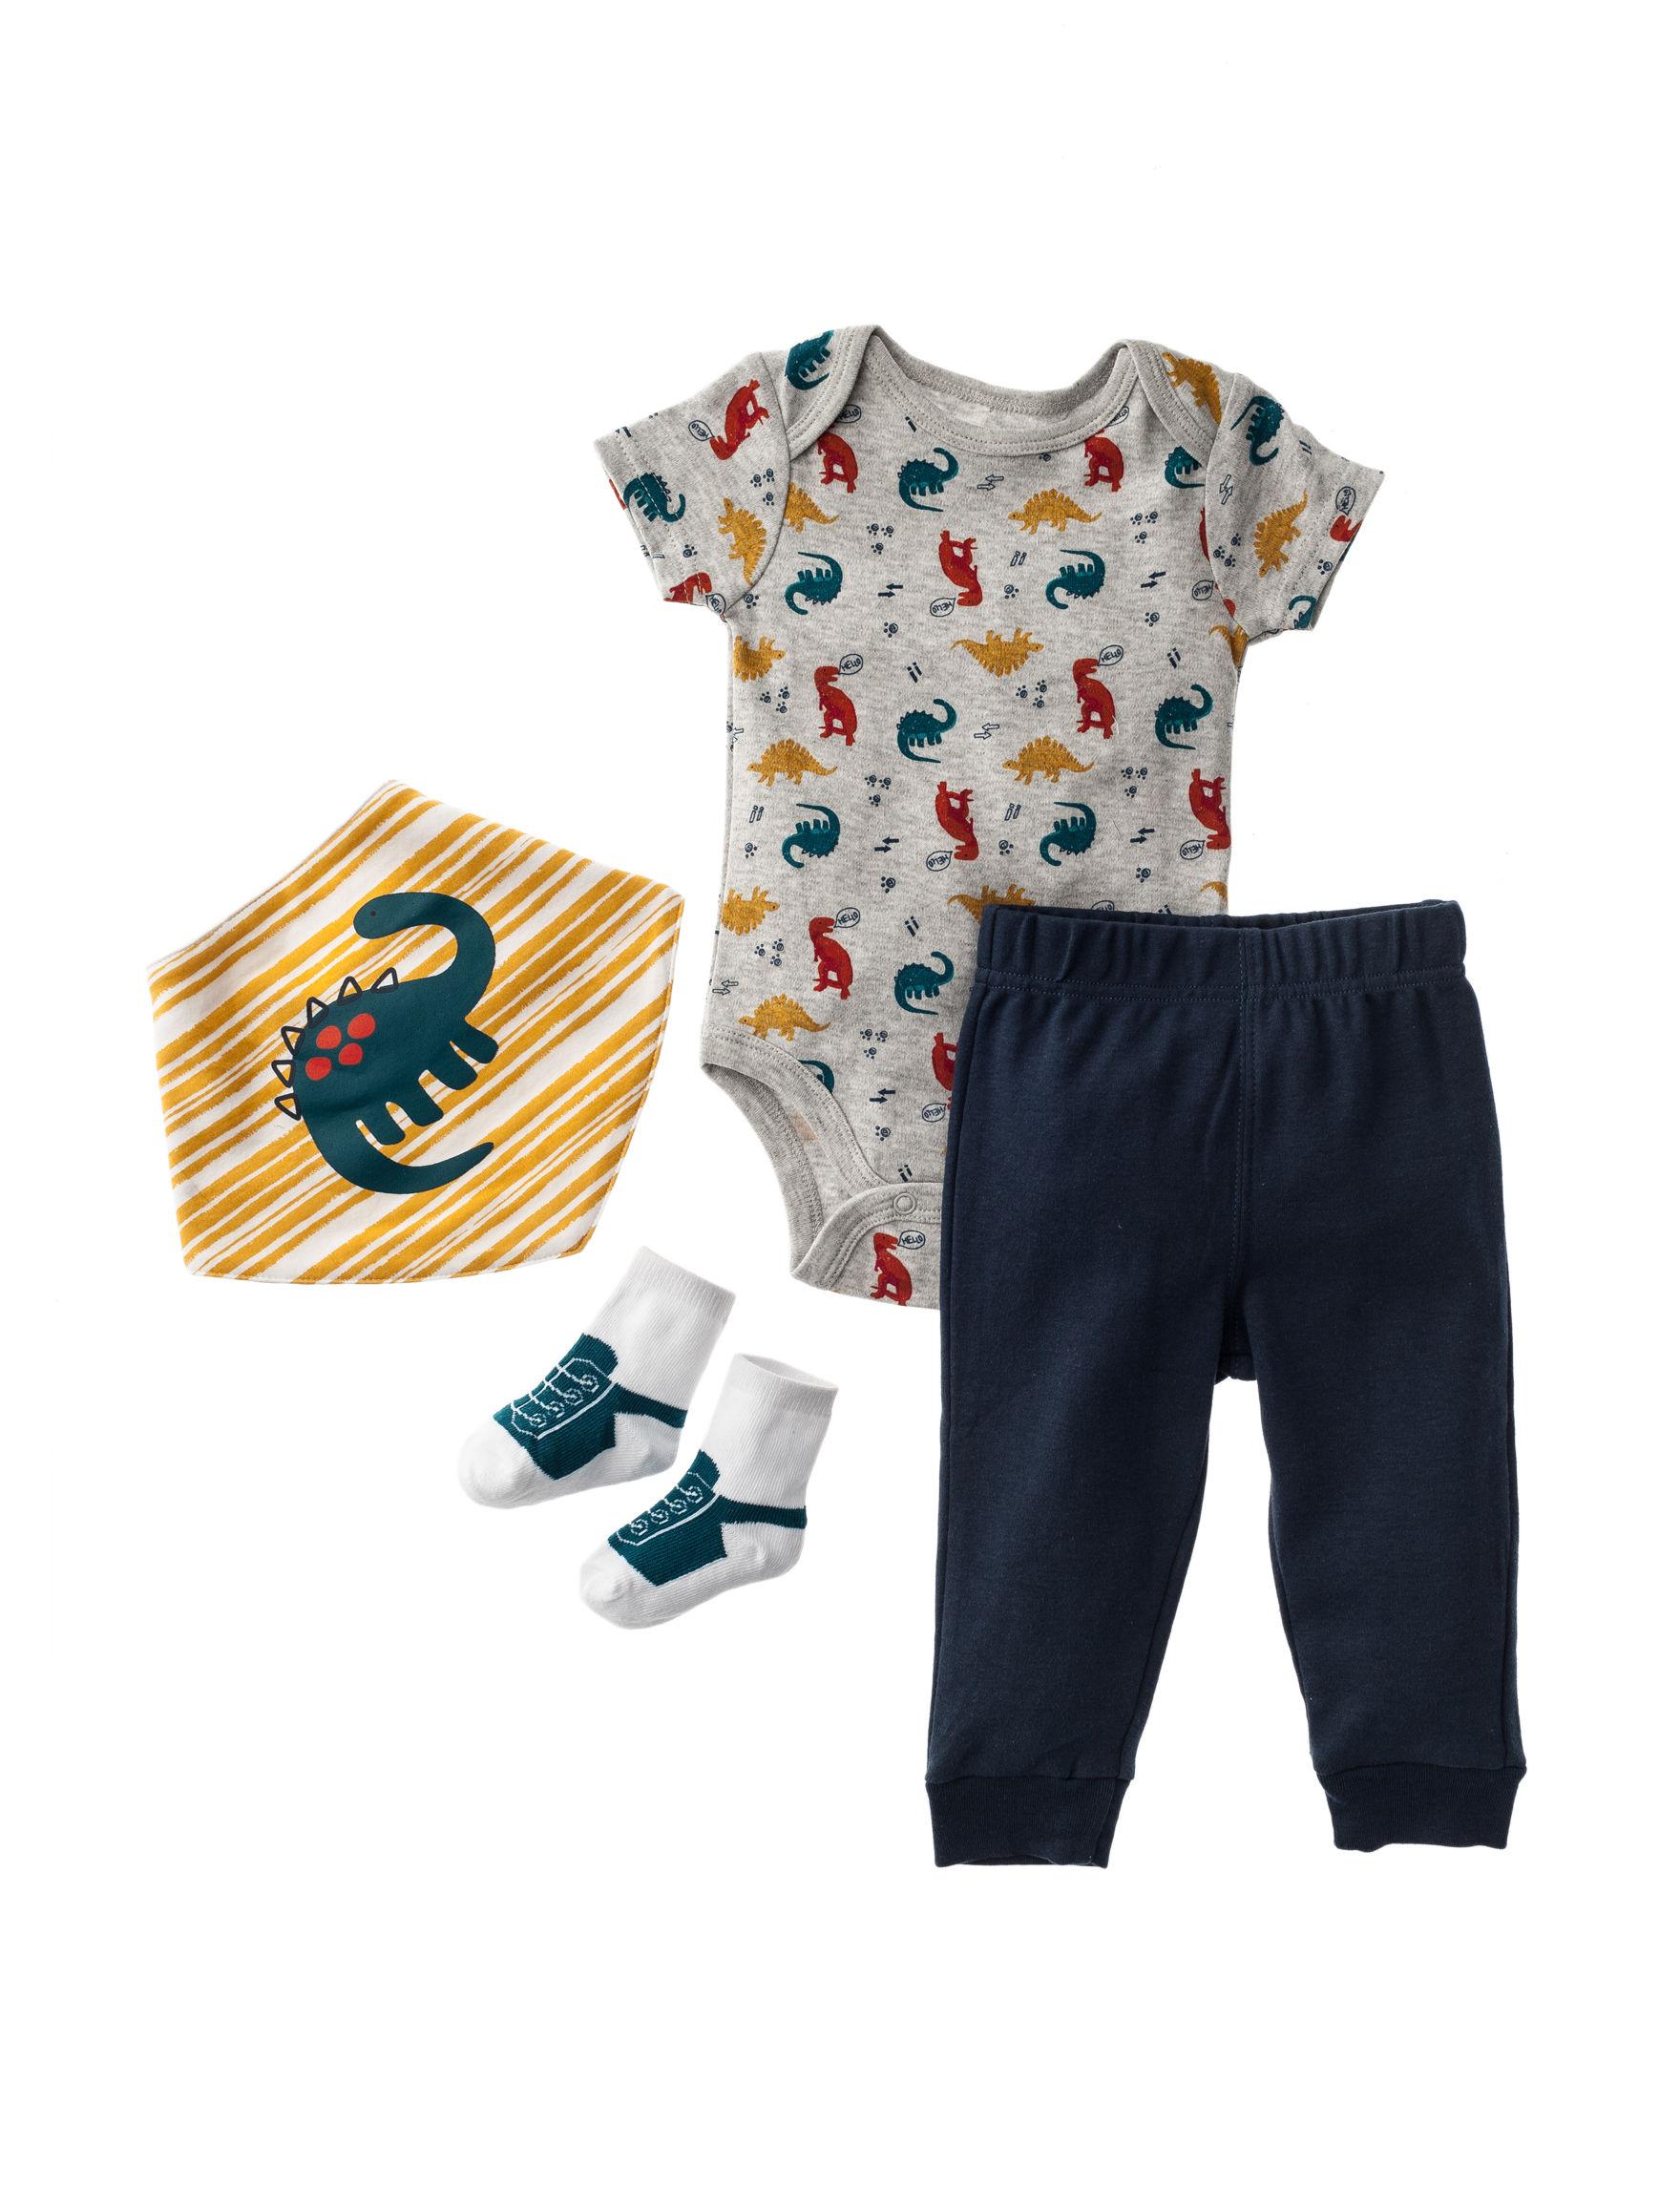 Baby Gear Navy